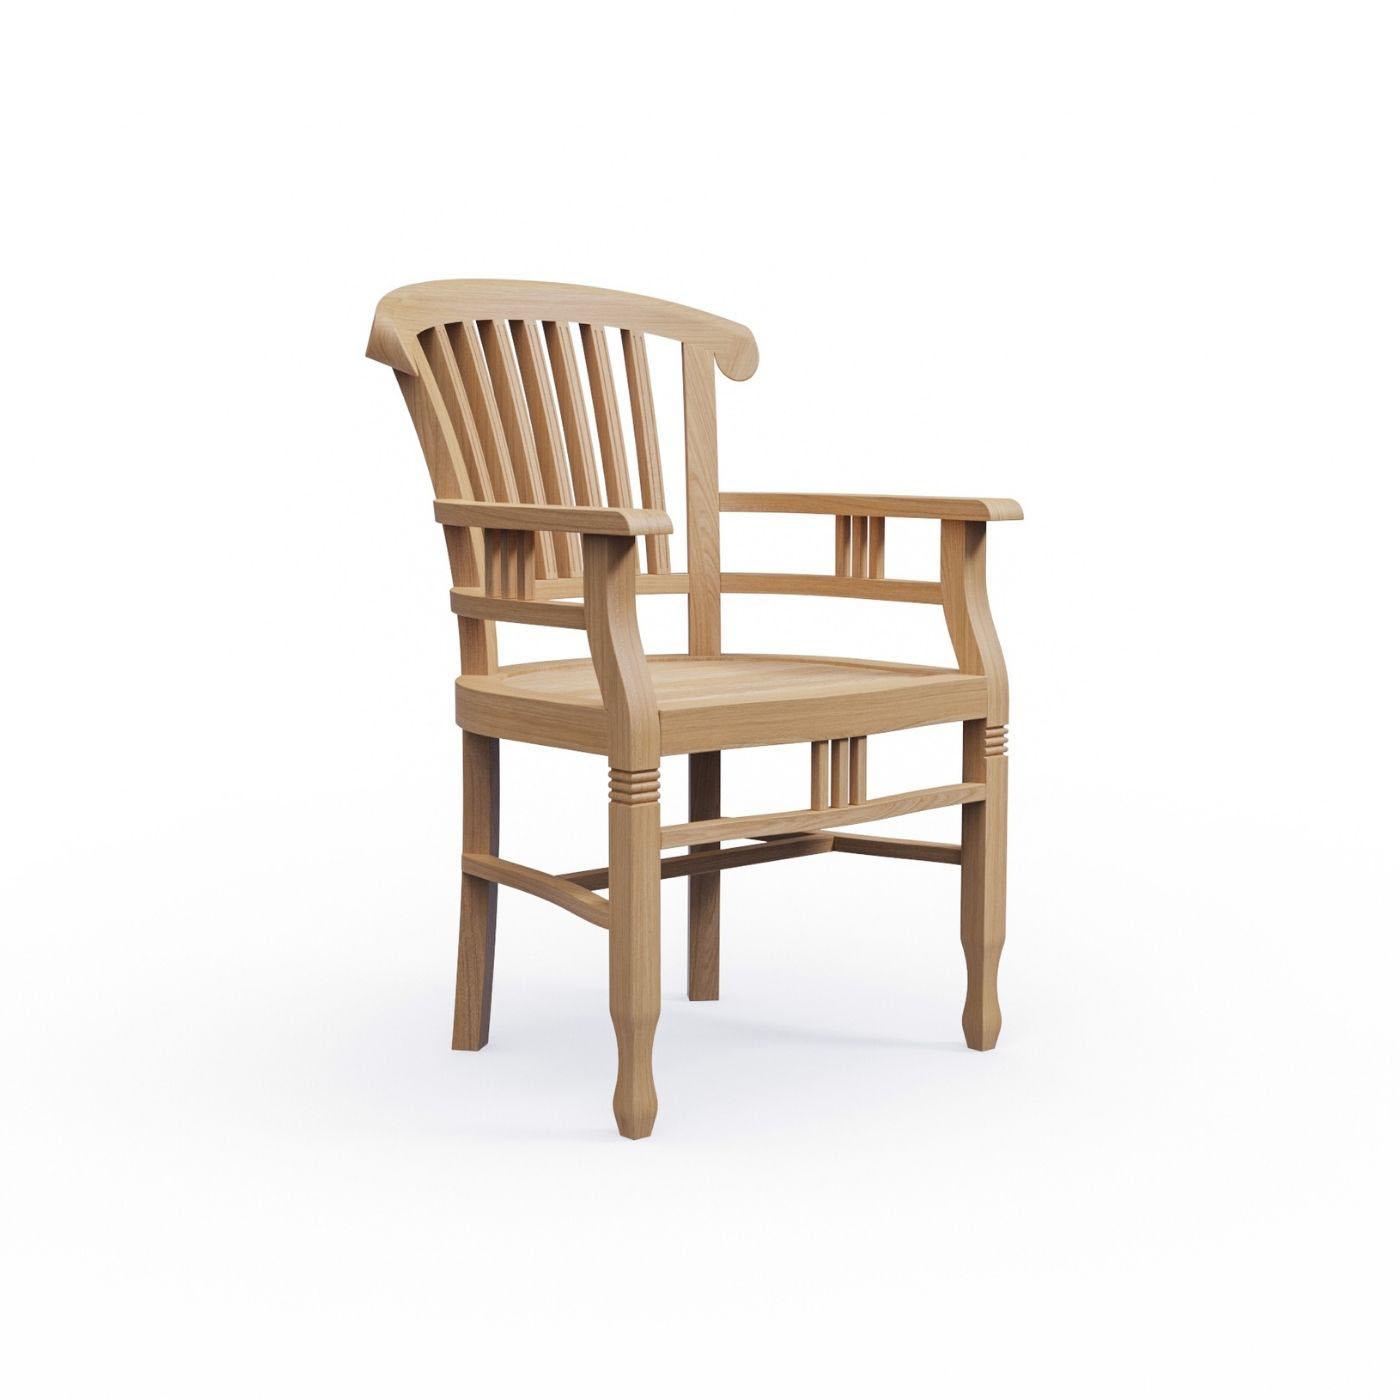 kmh teak gartensessel mit armlehnen gartenstuhl stuhl sessel holz colonial ebay. Black Bedroom Furniture Sets. Home Design Ideas